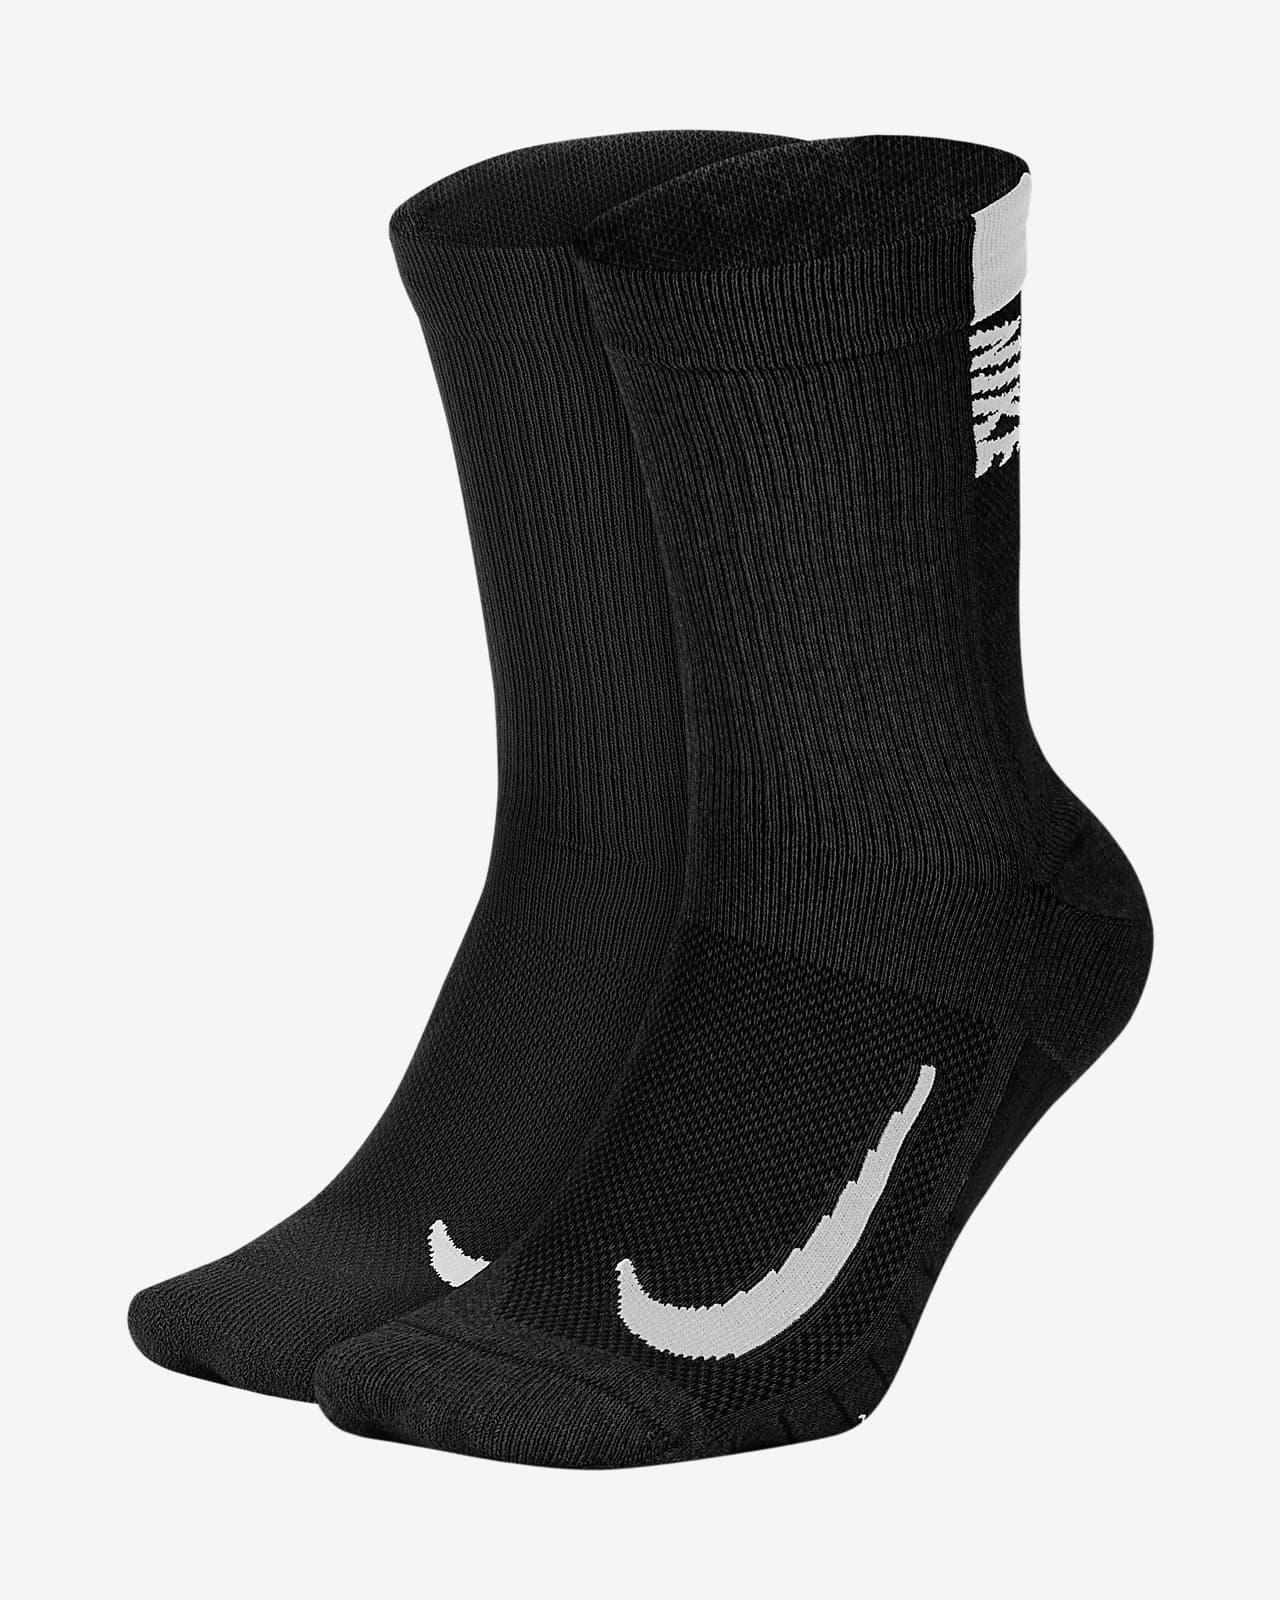 Calzettoni Nike Multiplier (2 paia)